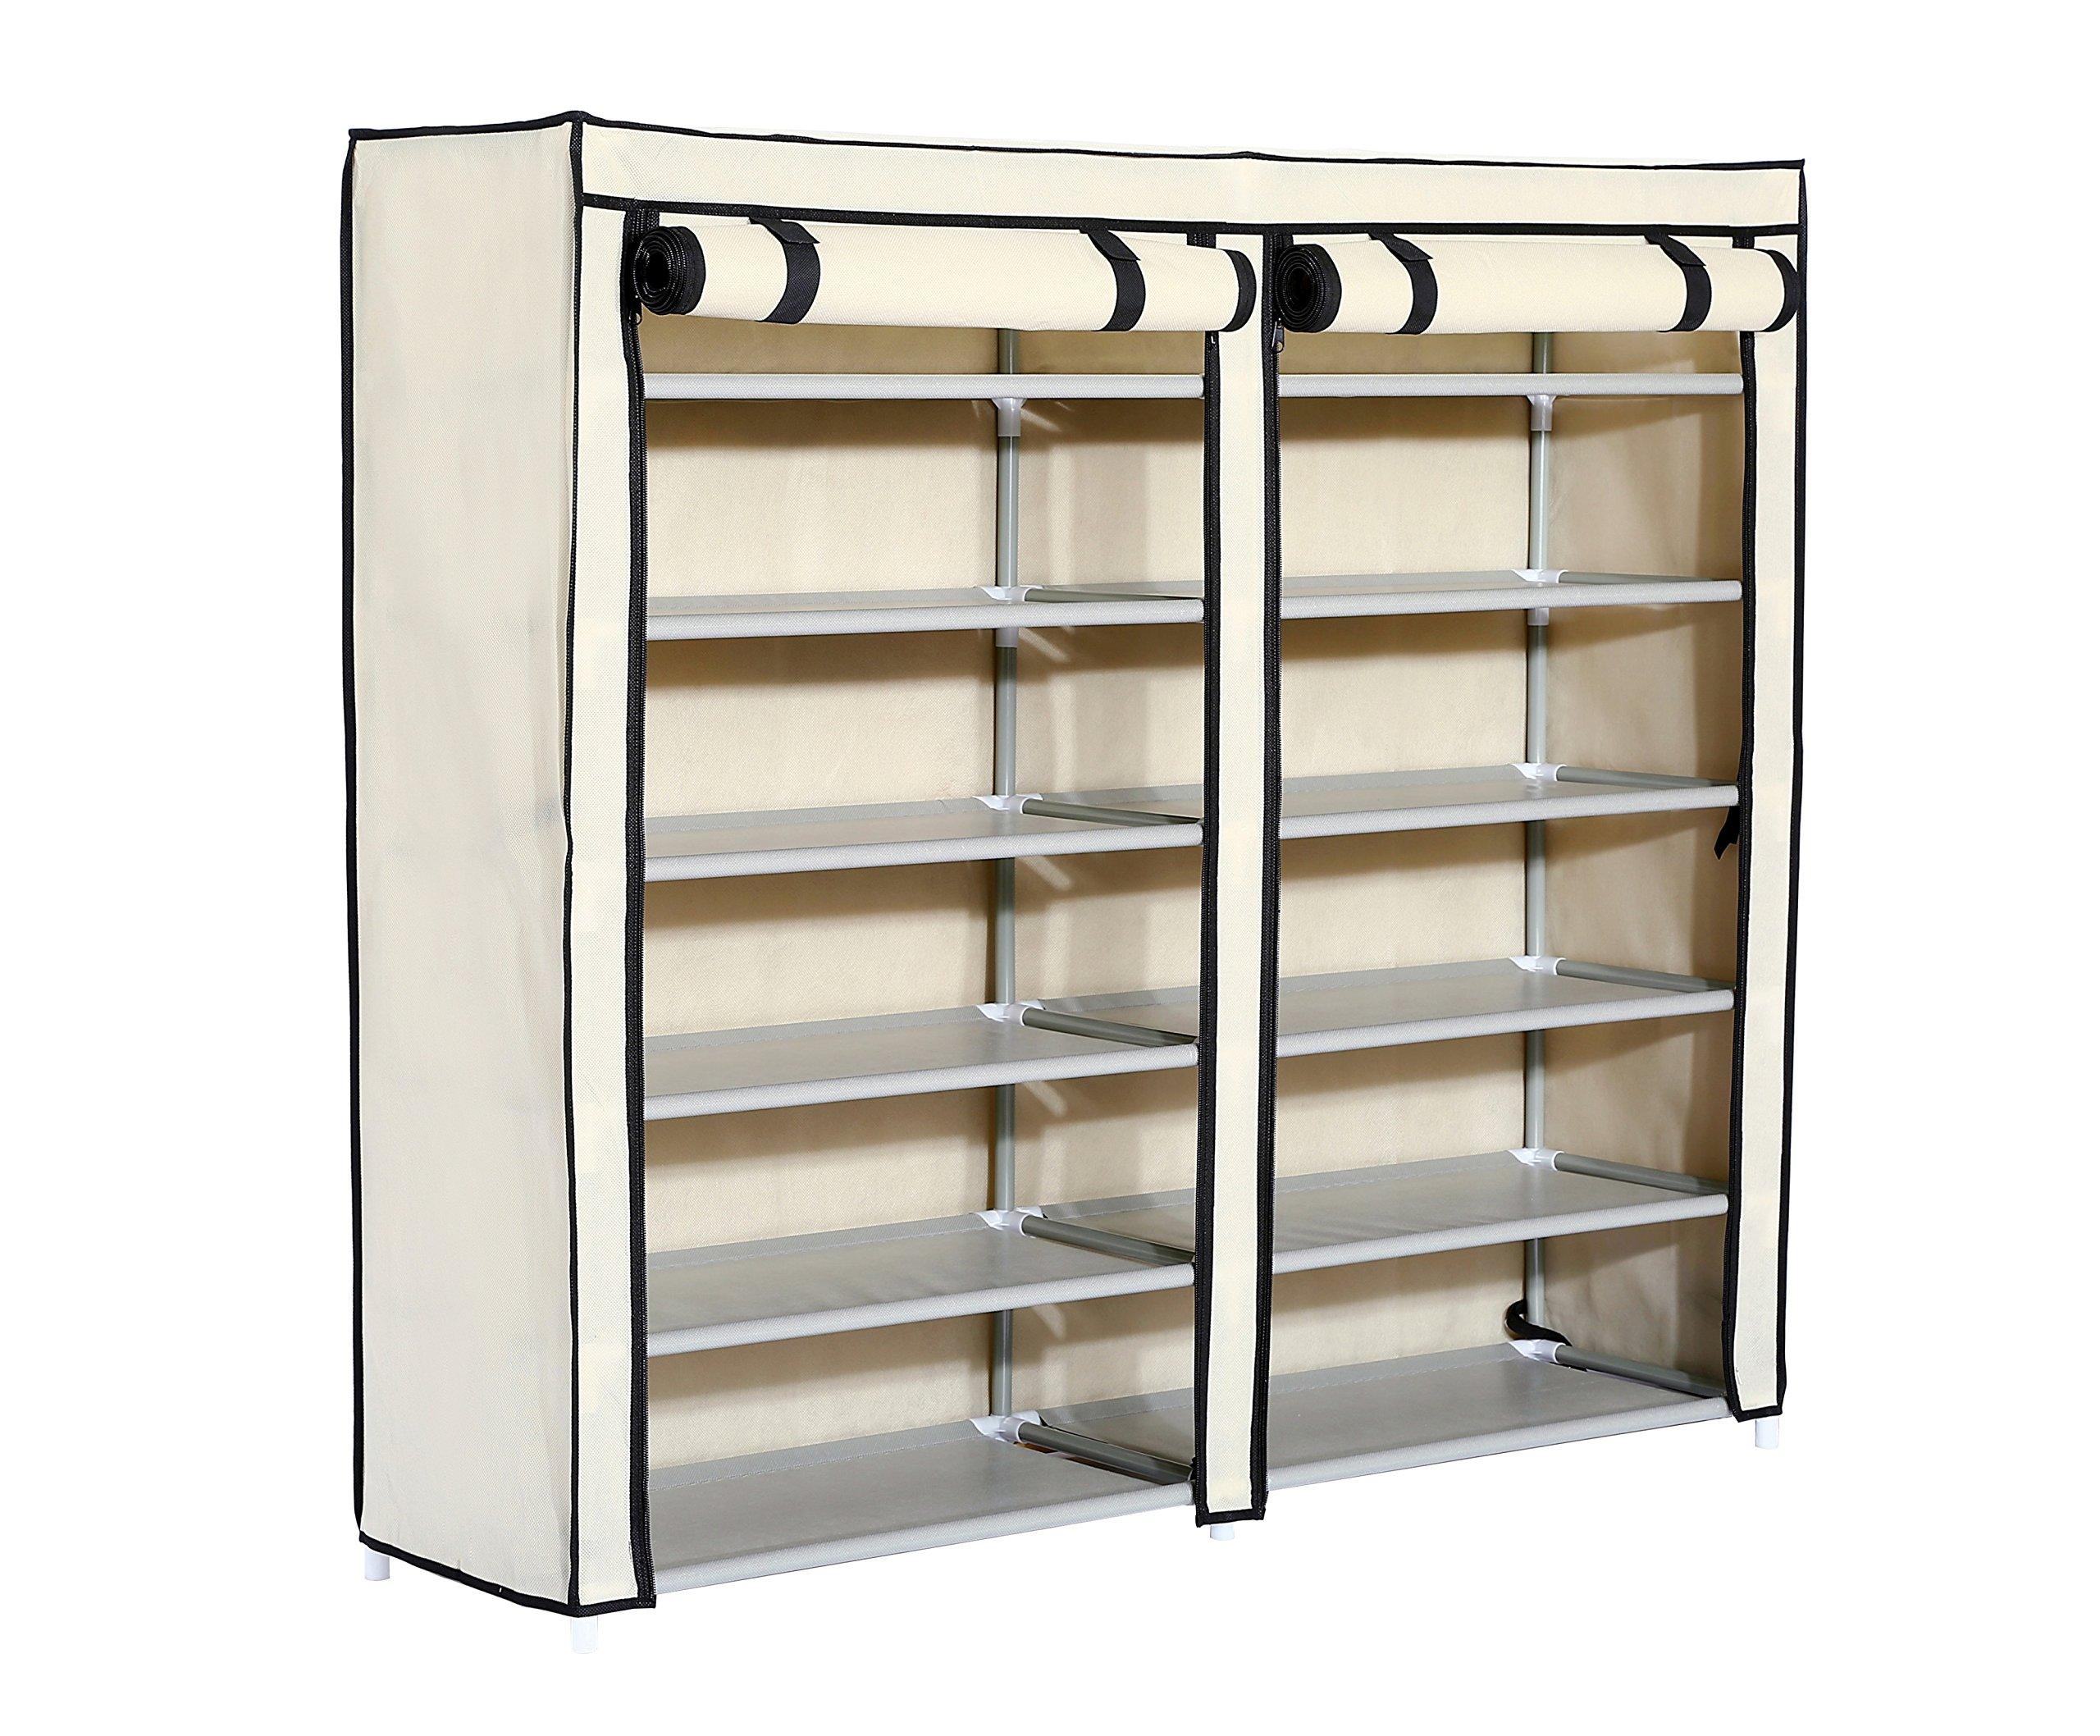 Sortwise® Storage Organizer Drawer Tower Storage Unit with 3 Removable Bins